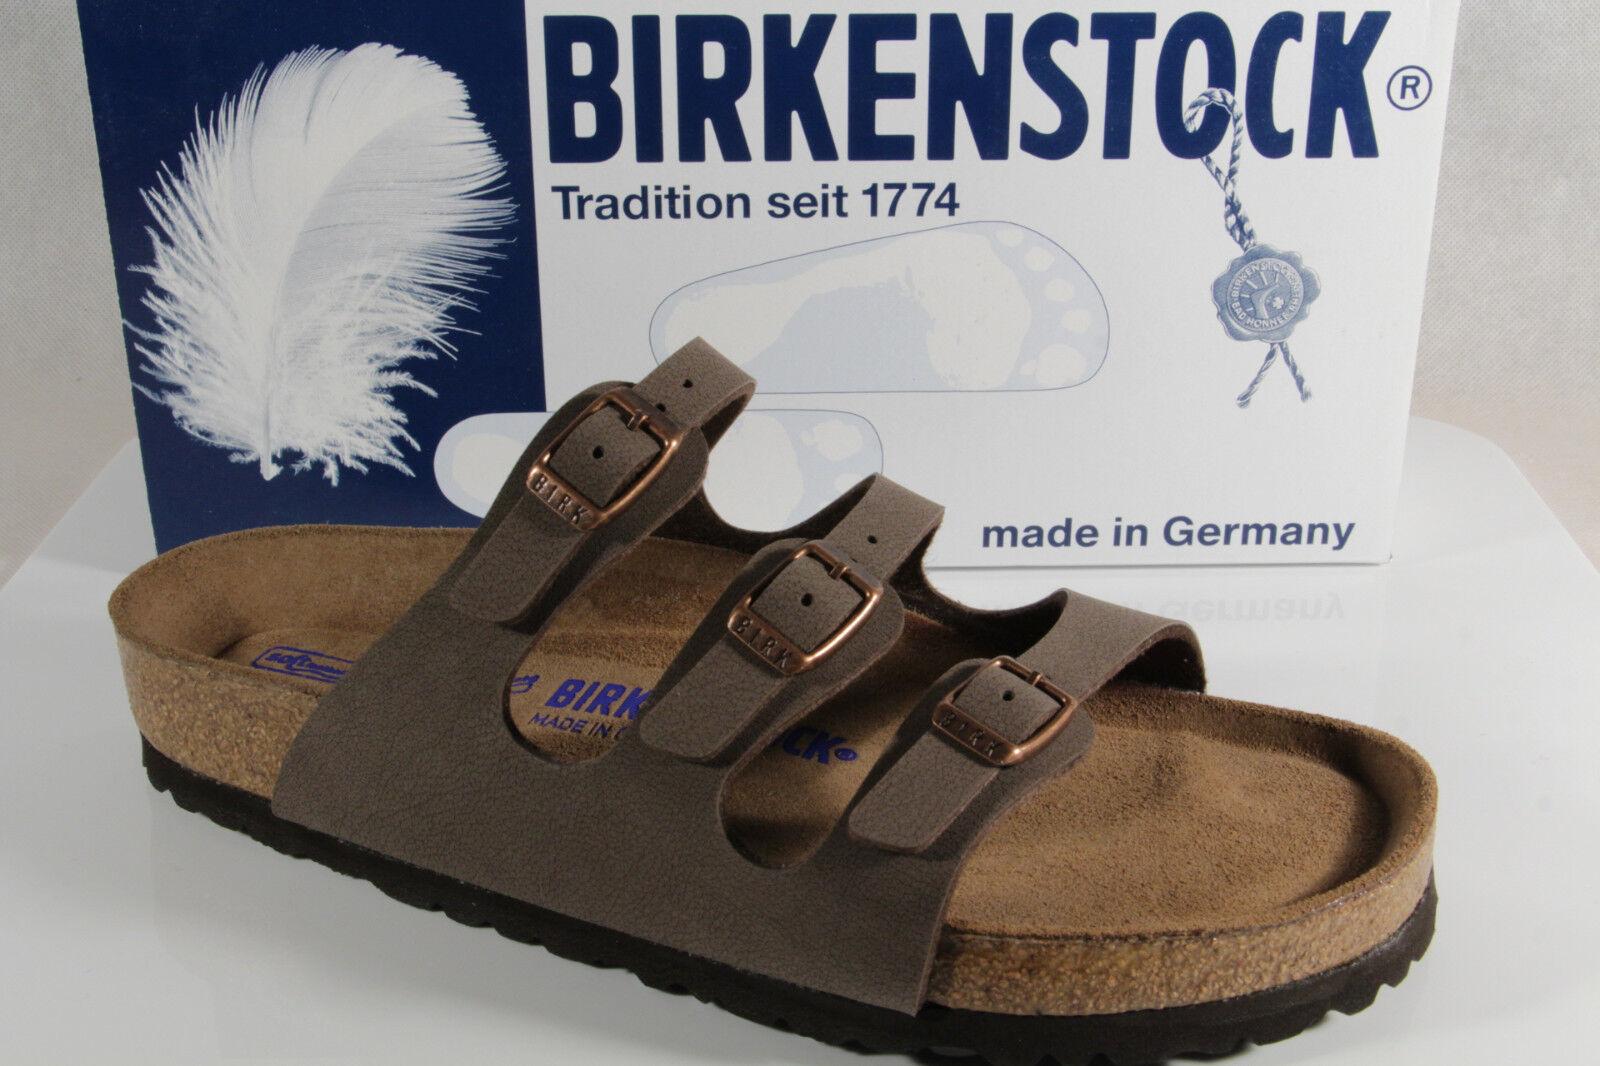 Birkenstock Sandalias Sandalias Sandalias de mujer Birkoflor Marrón 053881 NUEVO 8a2acb